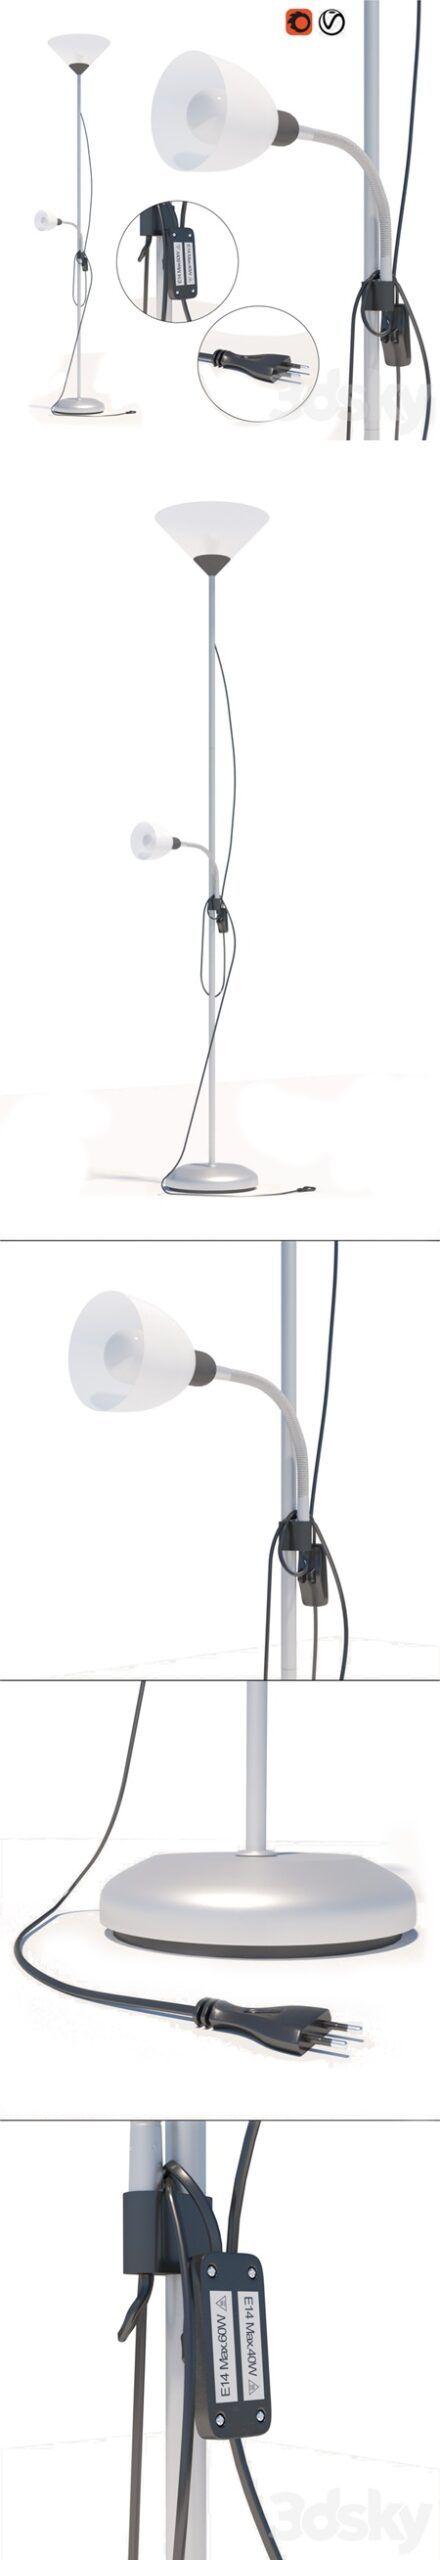 Leroy Merlin Basic Floor Lamp With Reading Lamp Basic Floor Lamp Reading Lamp Floor Lamp